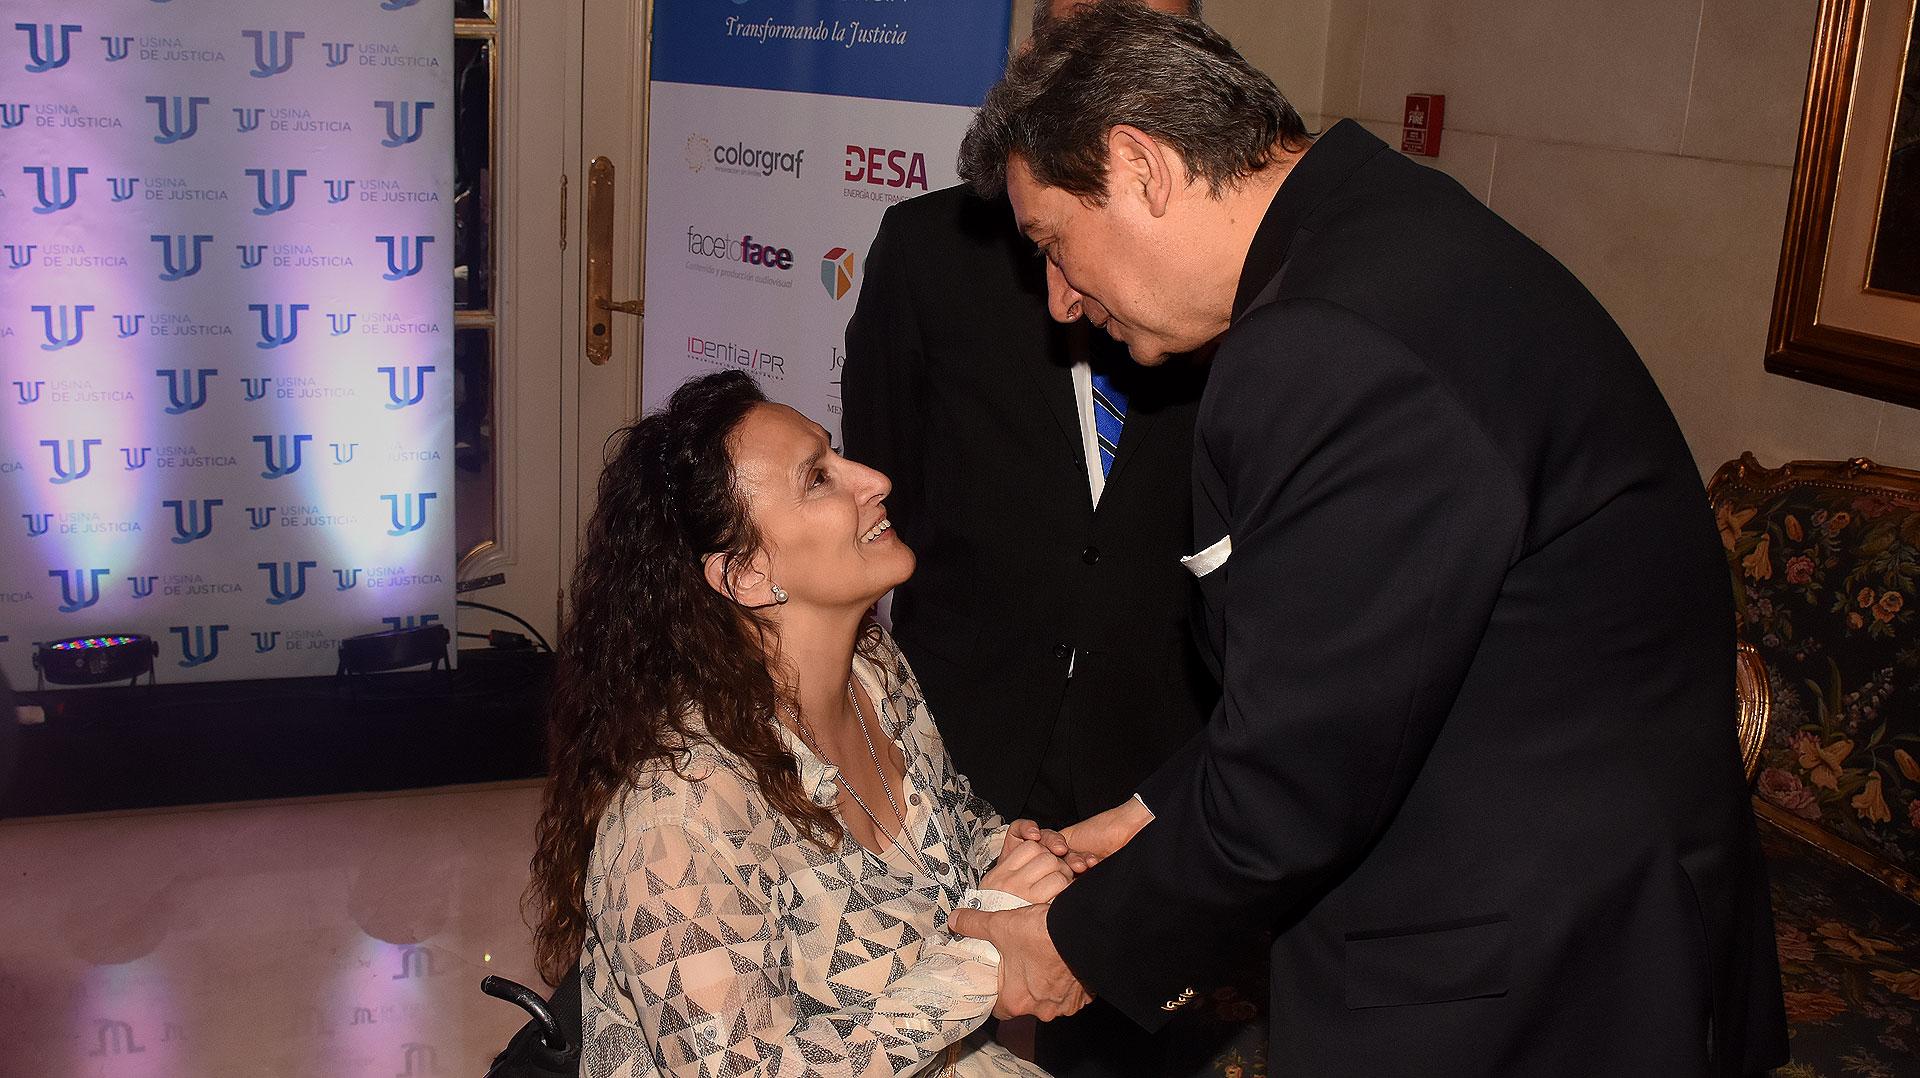 Gabriela Michetti y el juez Horacio Rosatti